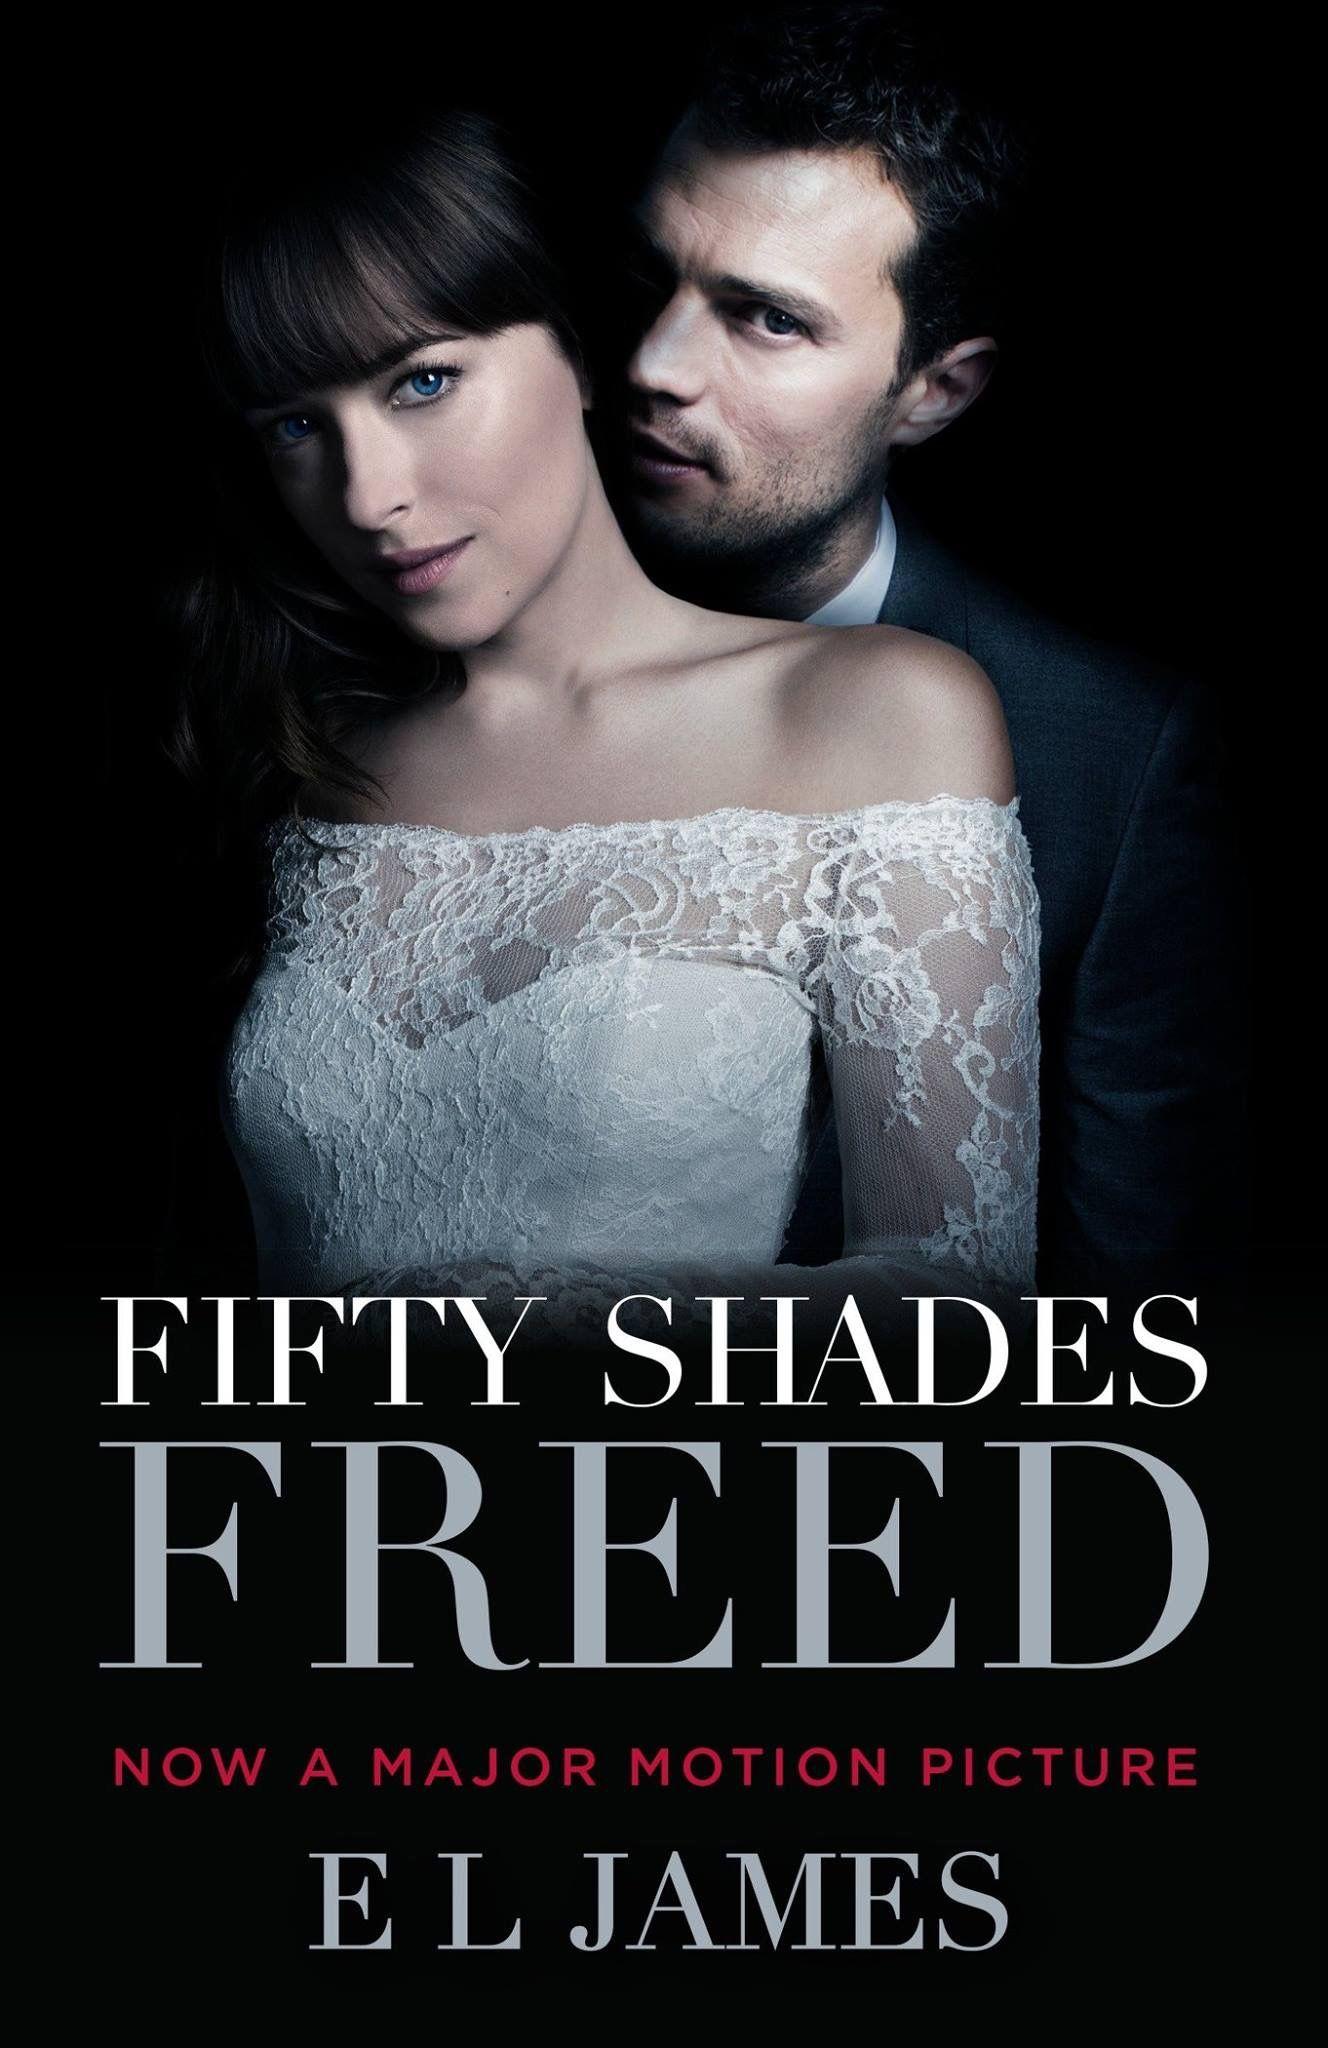 50shades of grey full movie online